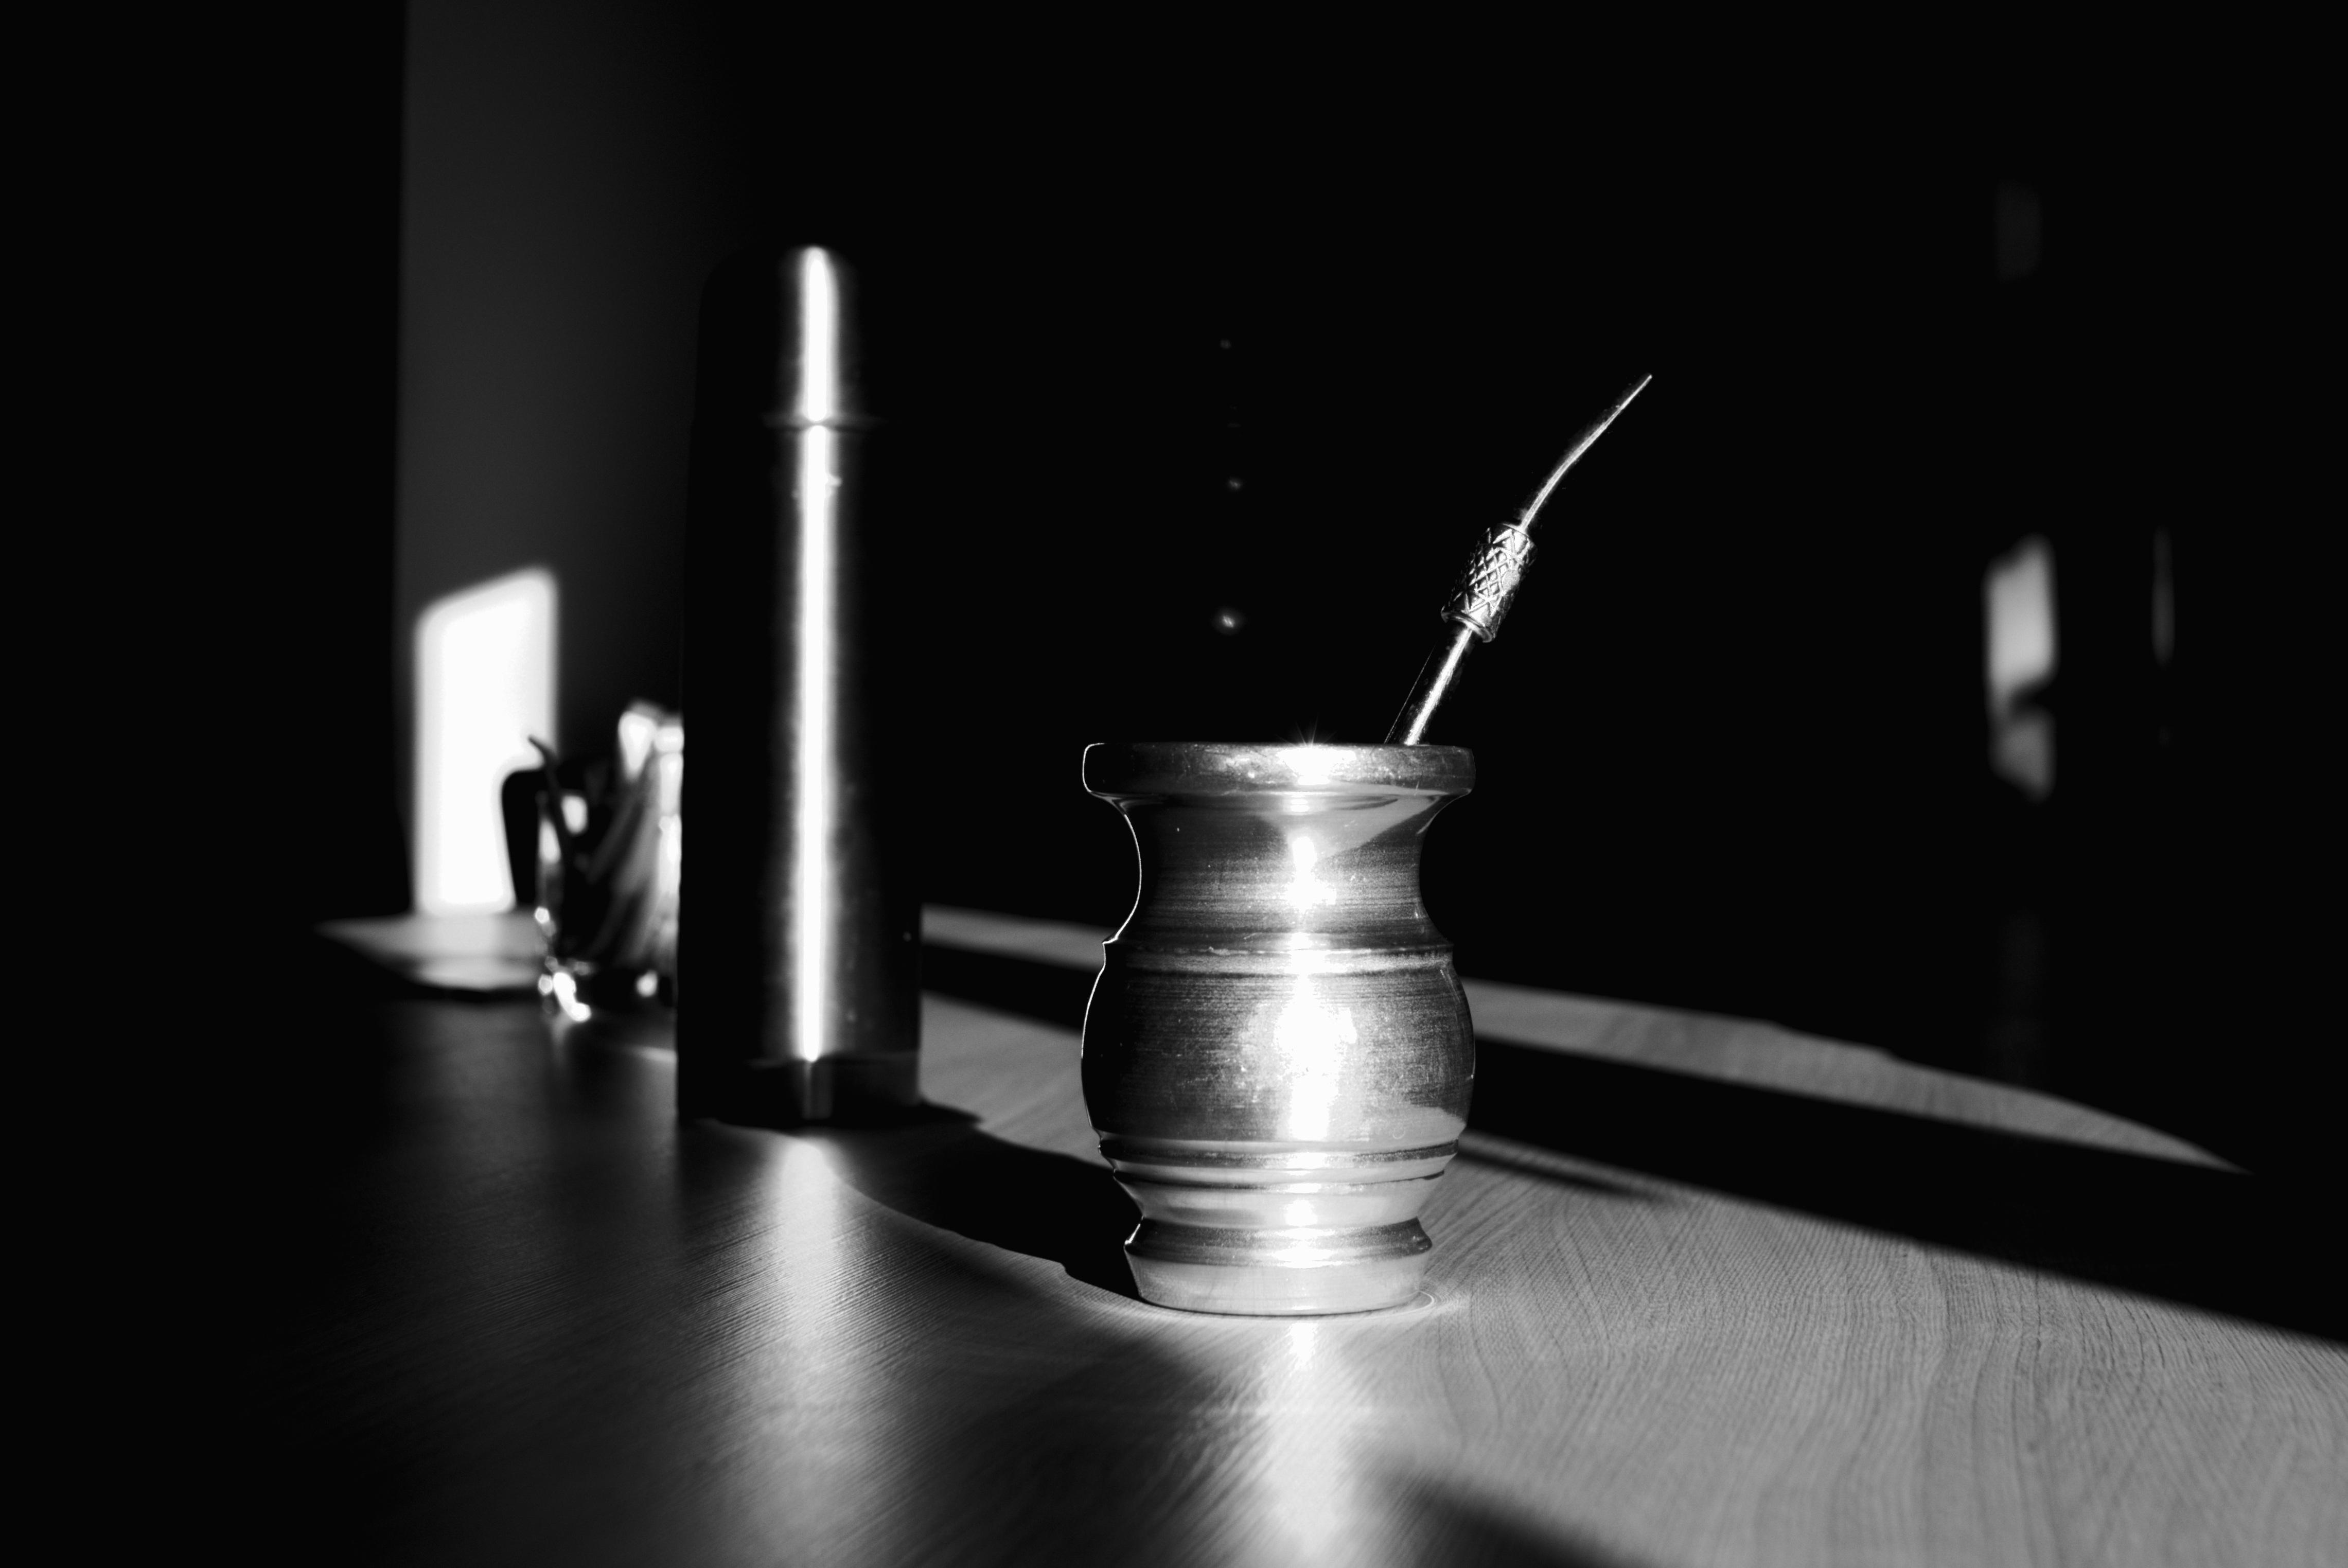 Gambar Kerja Kopi Hitam Dan Putih Teh Kaca Gelap Kantor Minum Kegelapan Satu Warna Penerangan Masih Hidup Bayangan Perak Kebangkitan Menekankan Kelelahan Yerba Pasangan Hidup Masih Fotografi Fotografi Monokrom Lembur 4563x3047